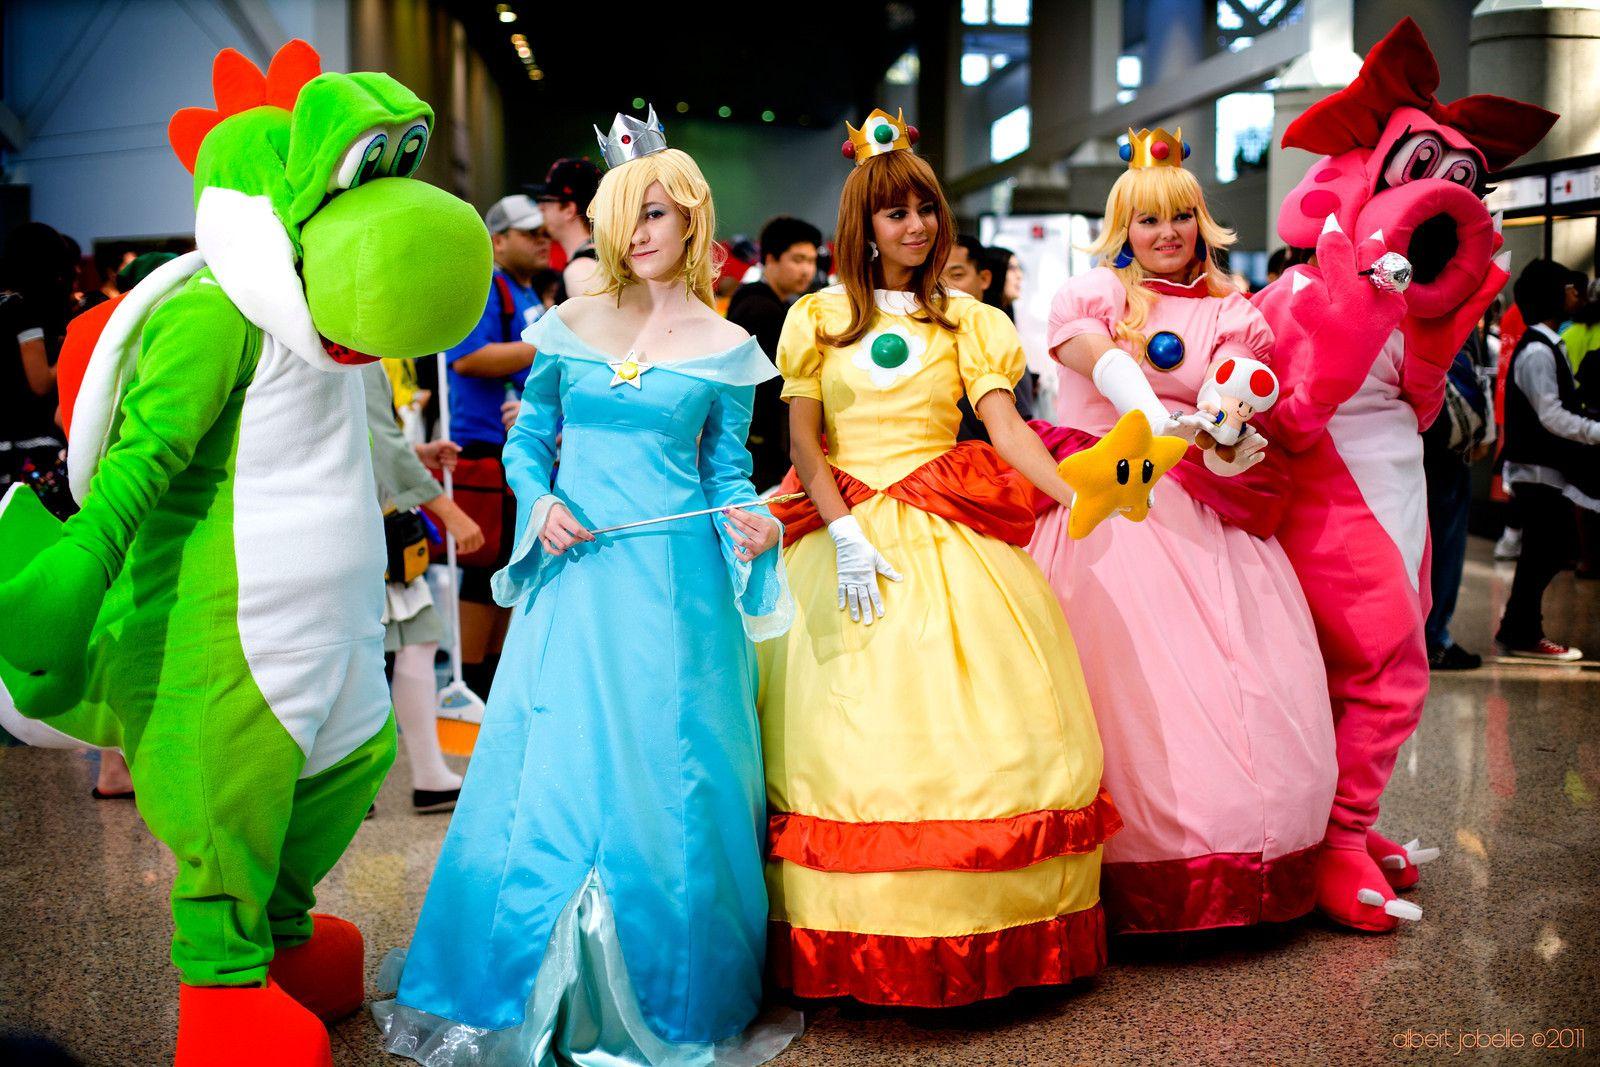 Nintendo Cosplaying Group By Chingrish On Deviantart Mario